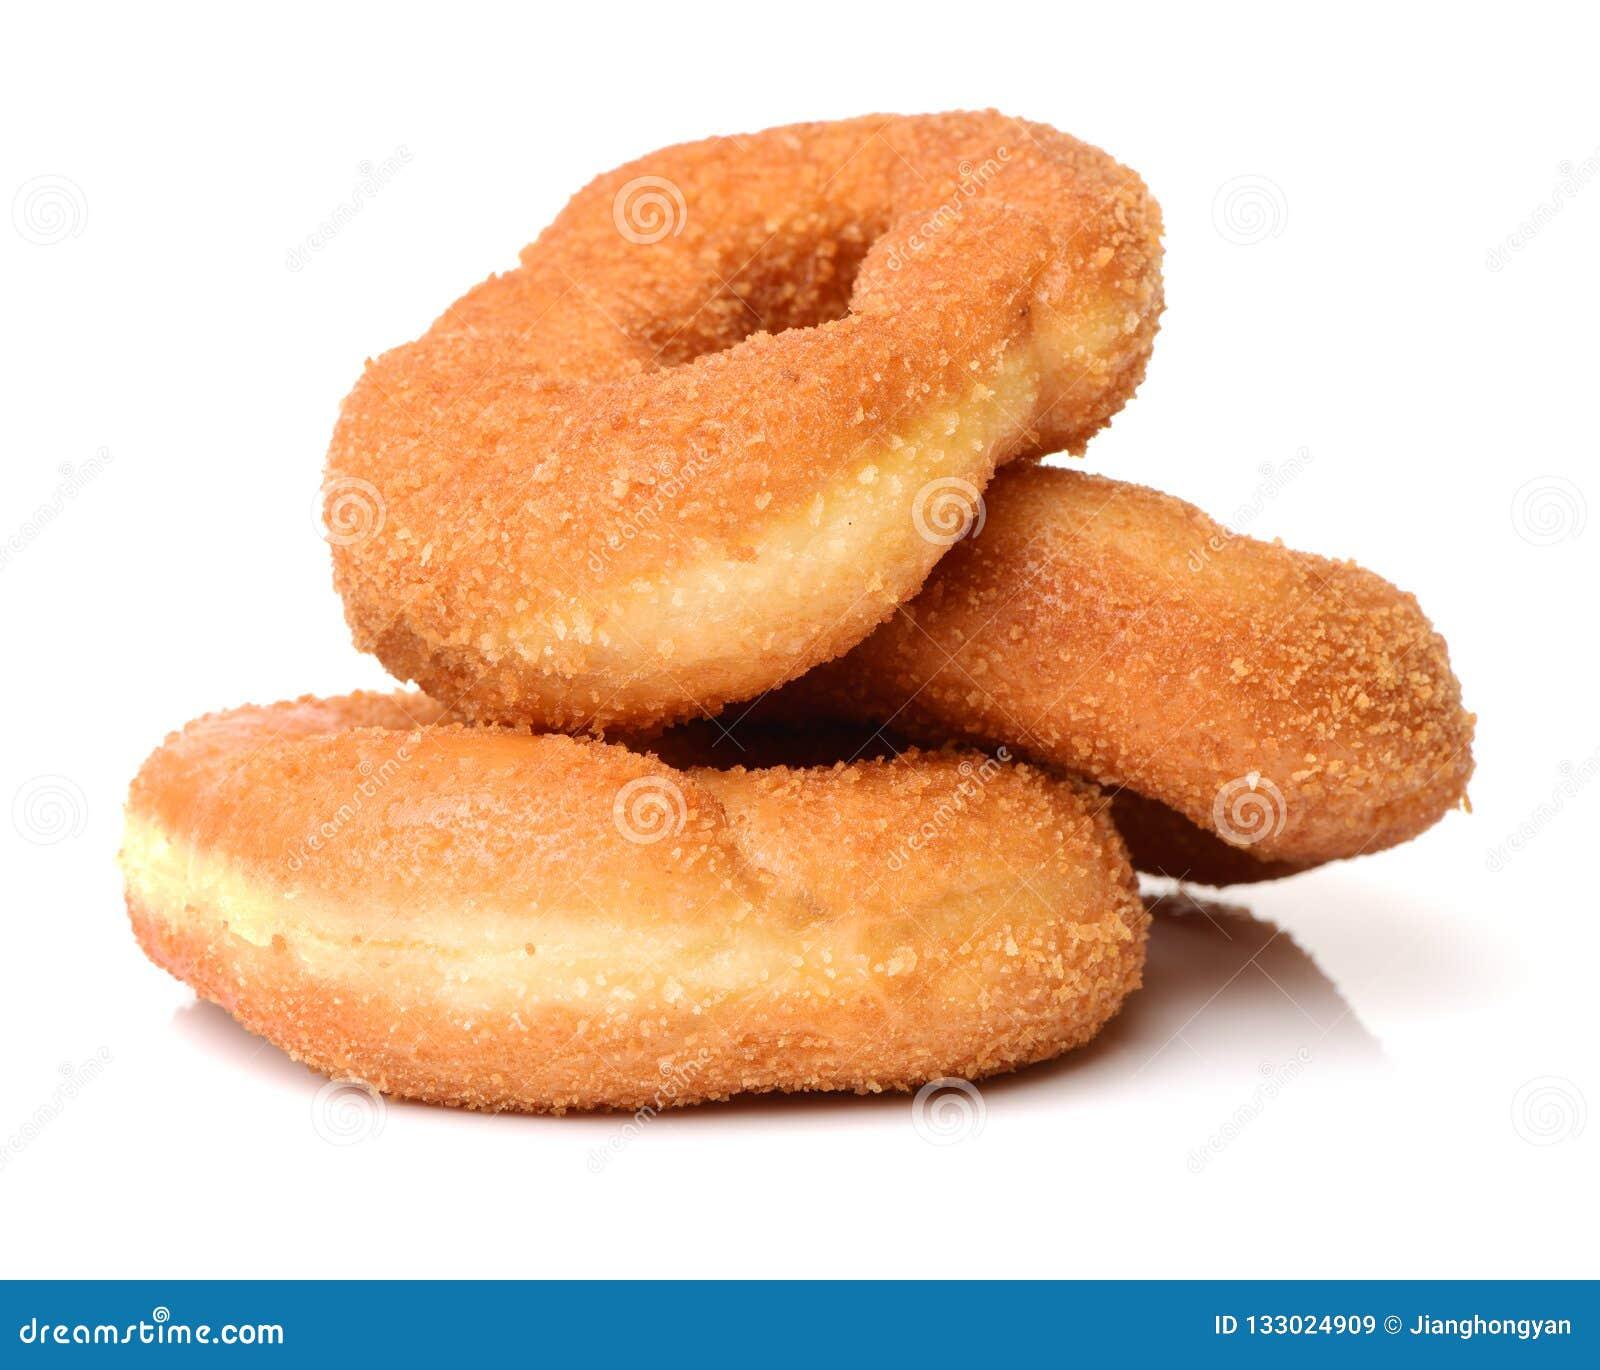 Sugared cake doughnut